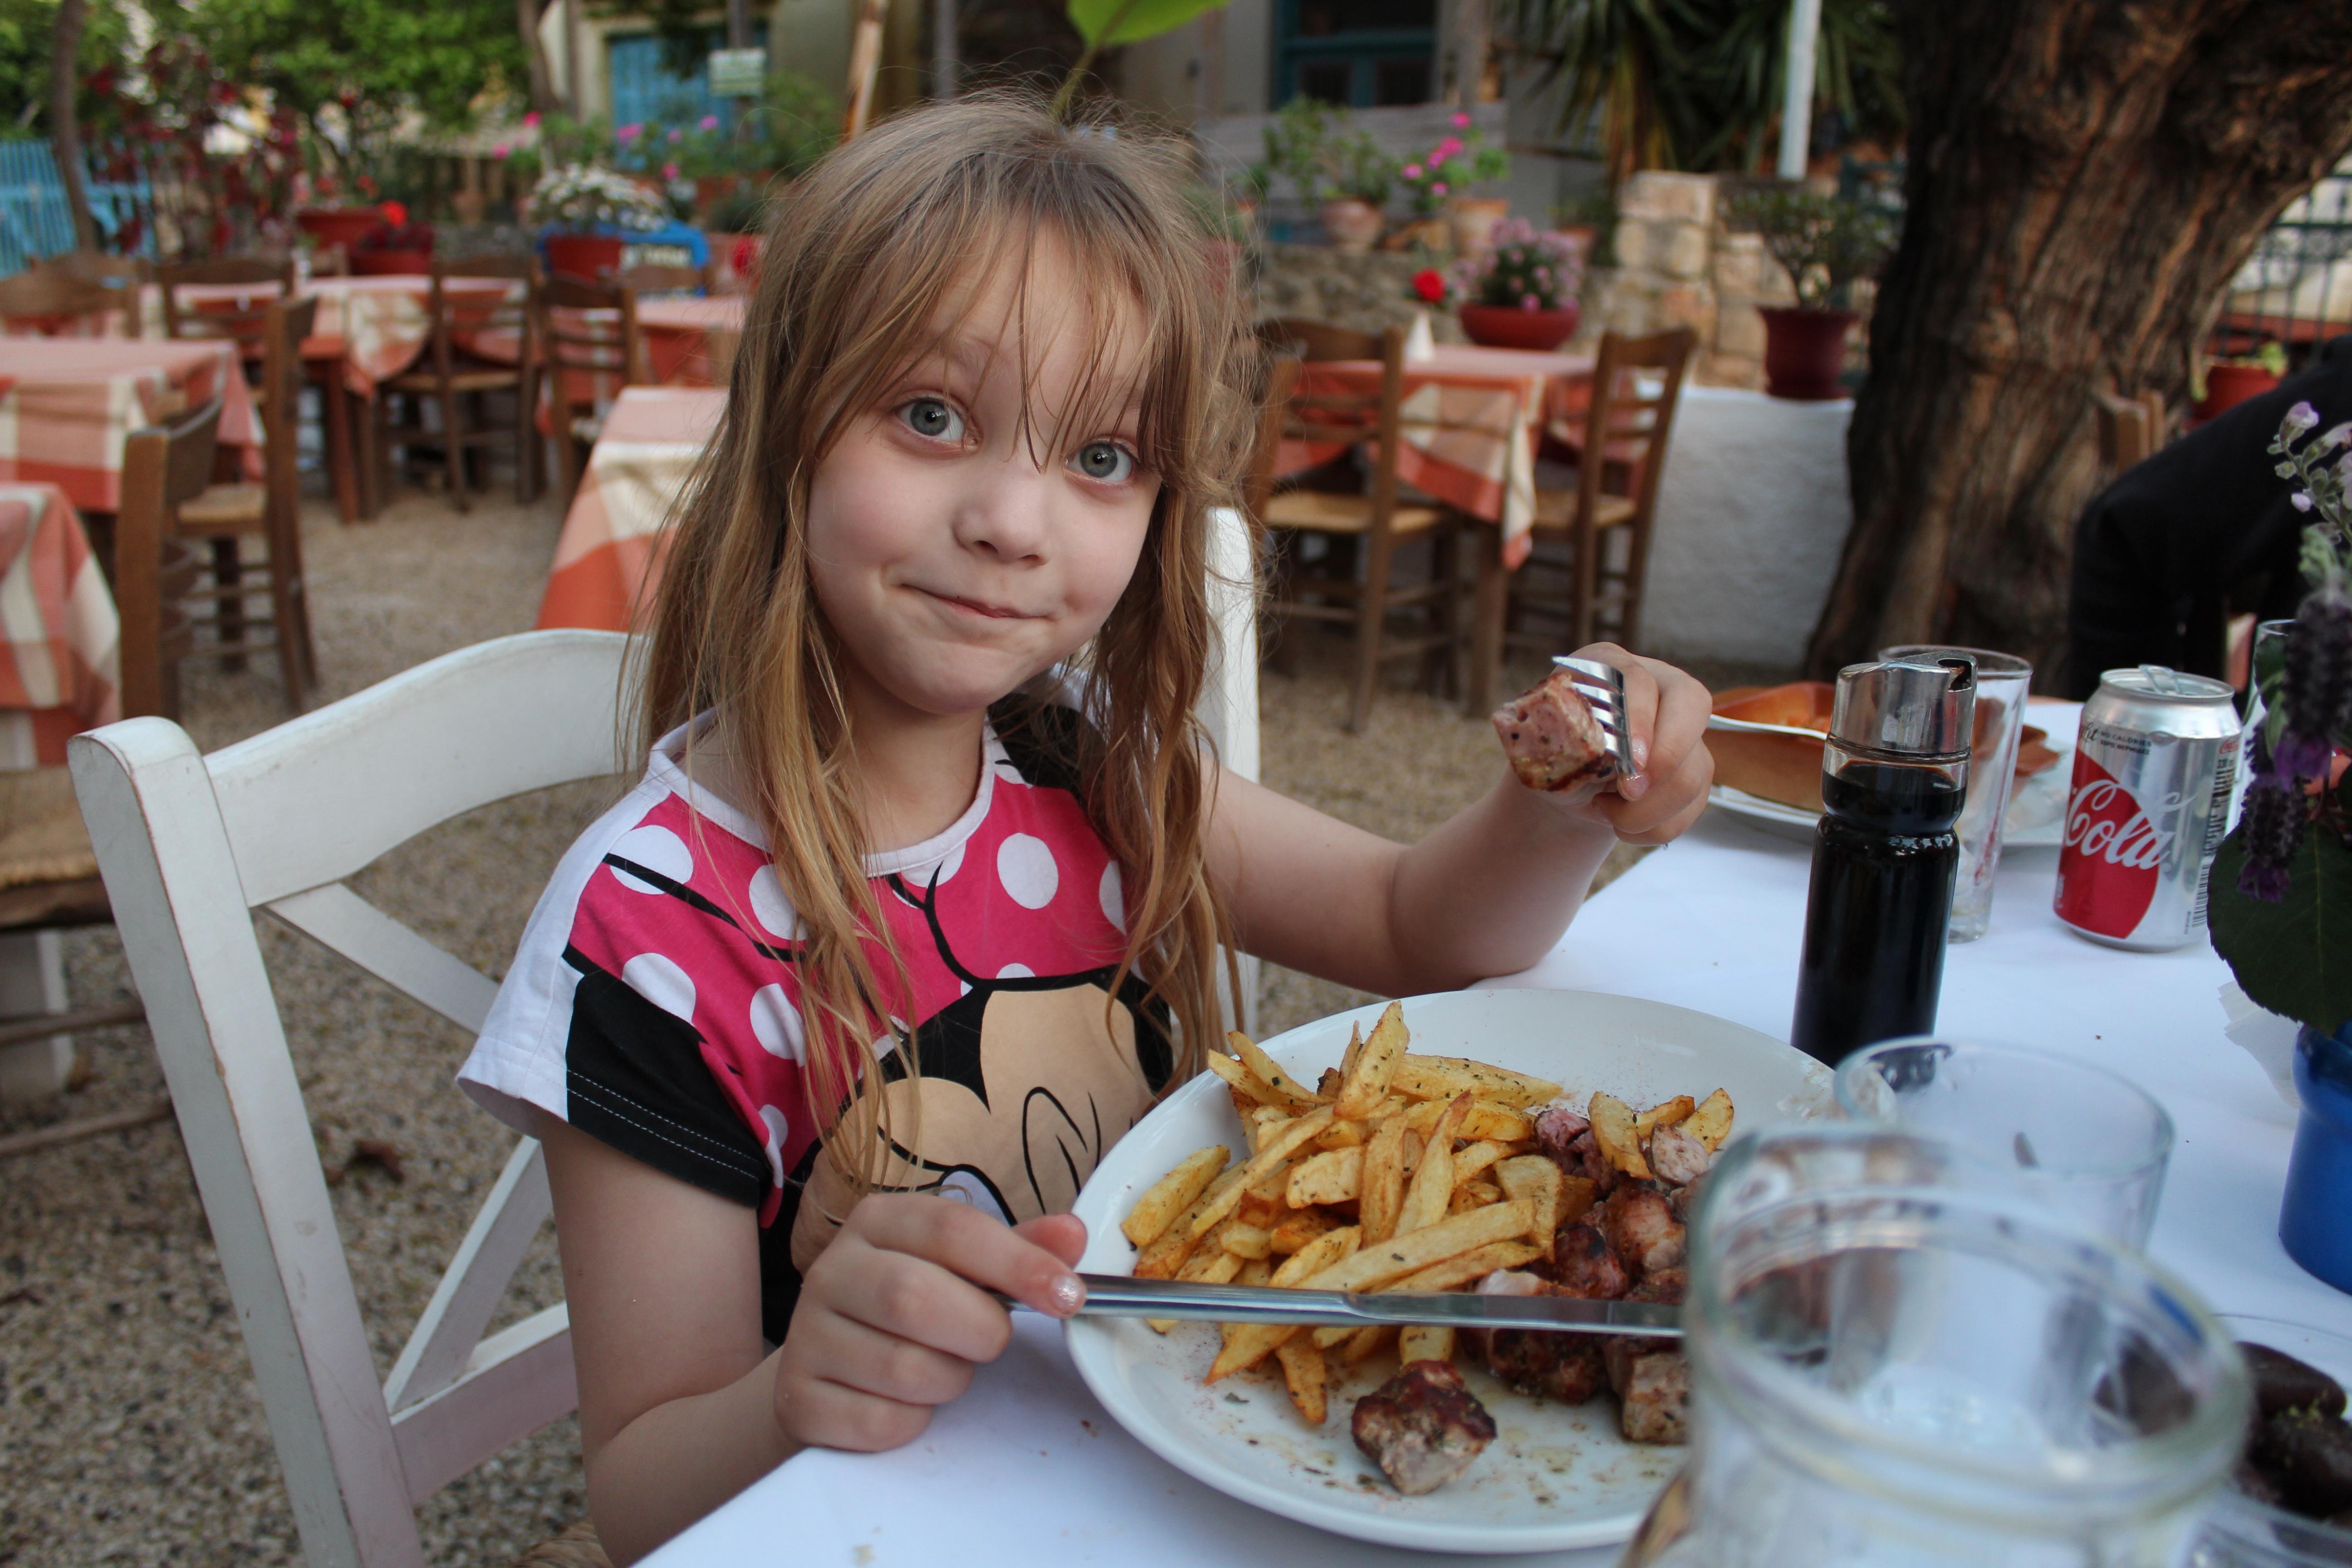 restaurants in stoupa melissa (pork souvlaki and chips)